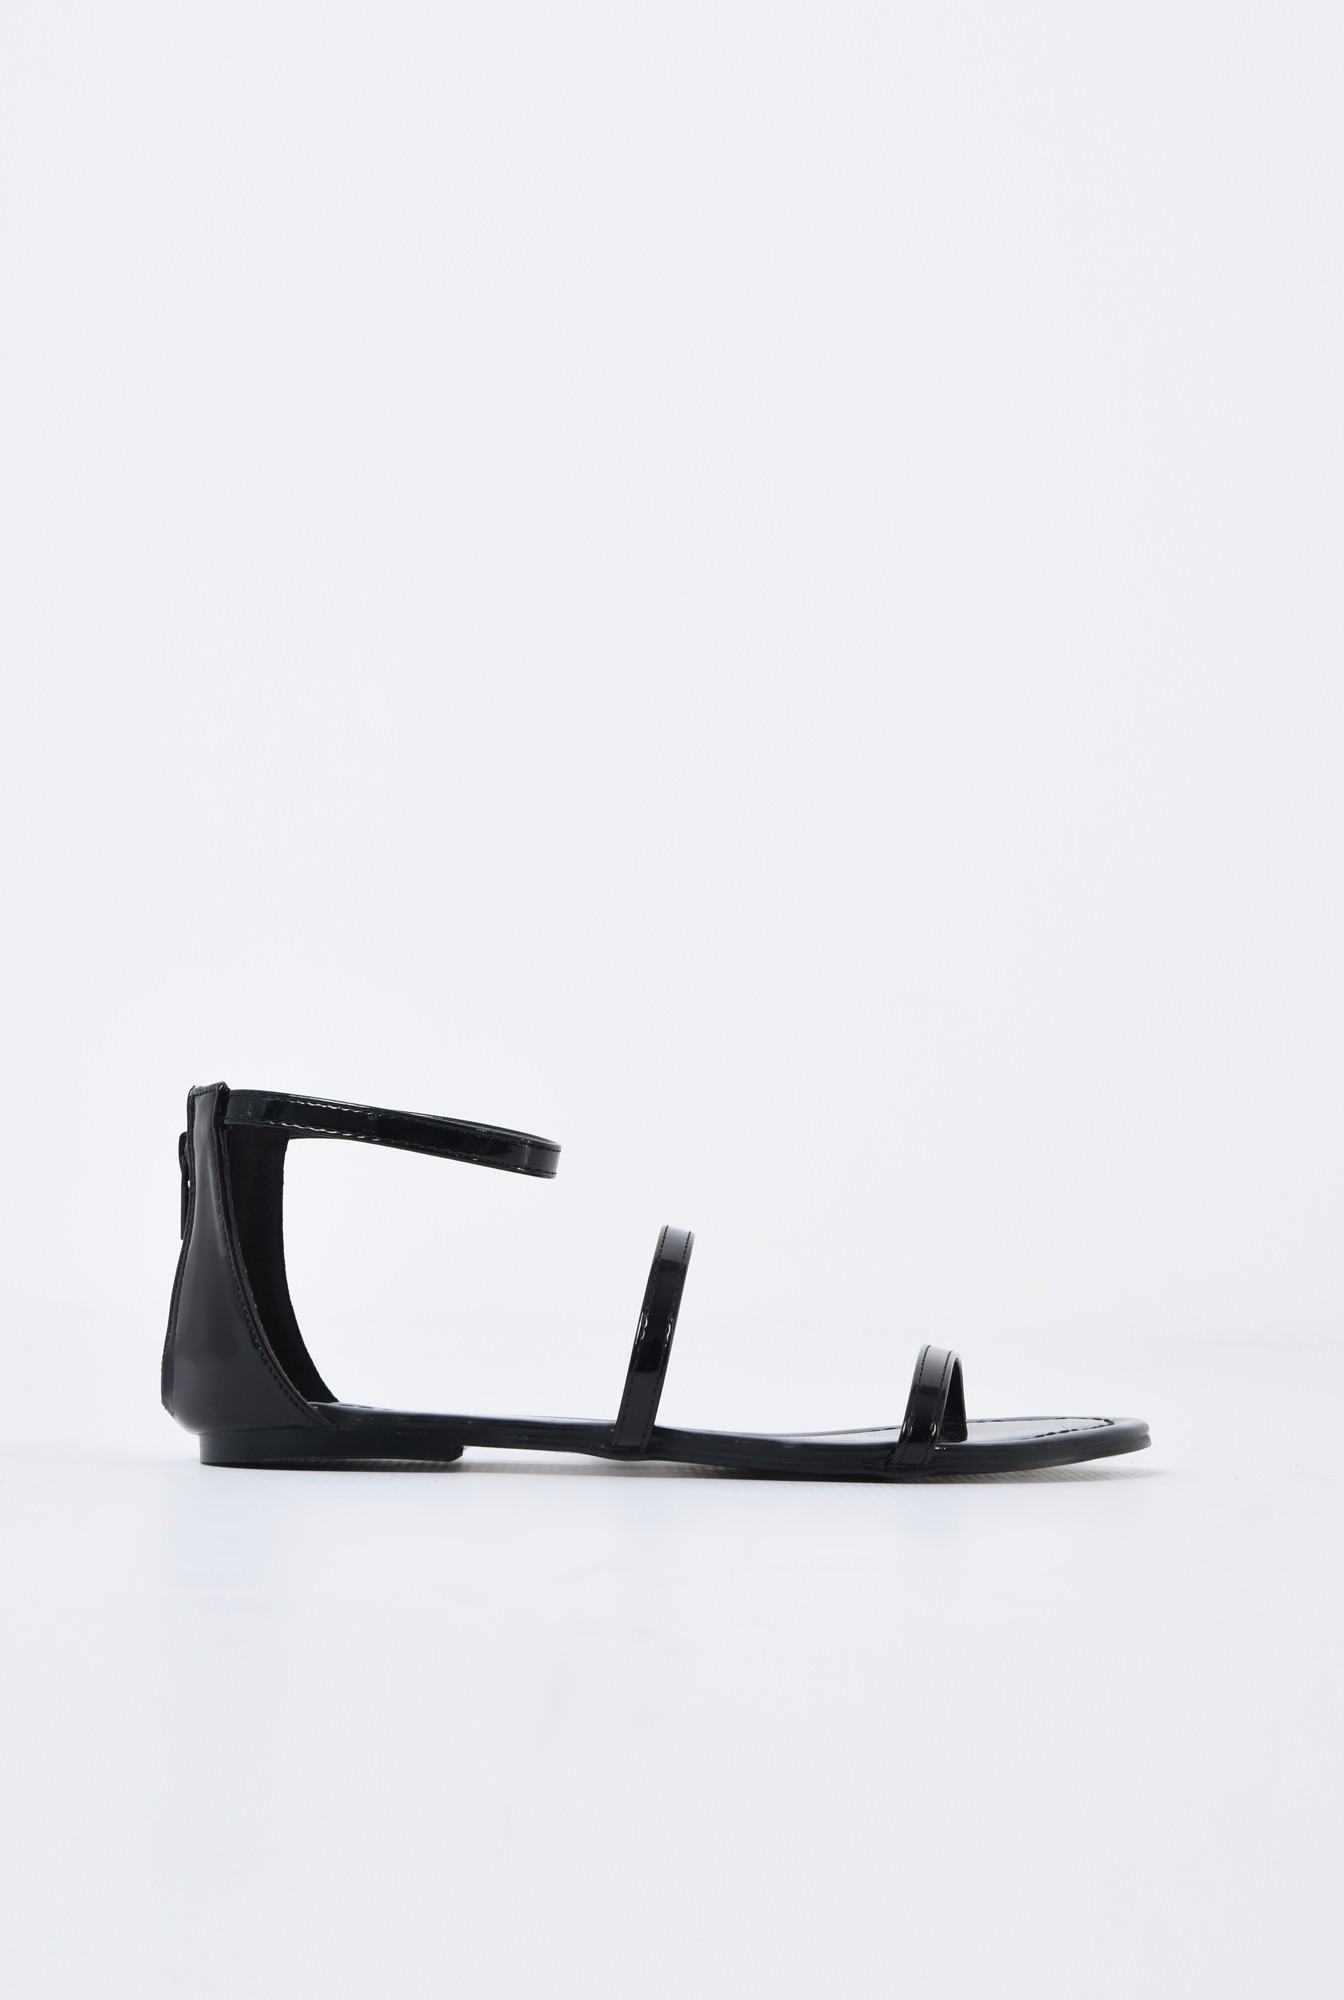 0 - sandale casual, cu talpa joasa, barete subtiri